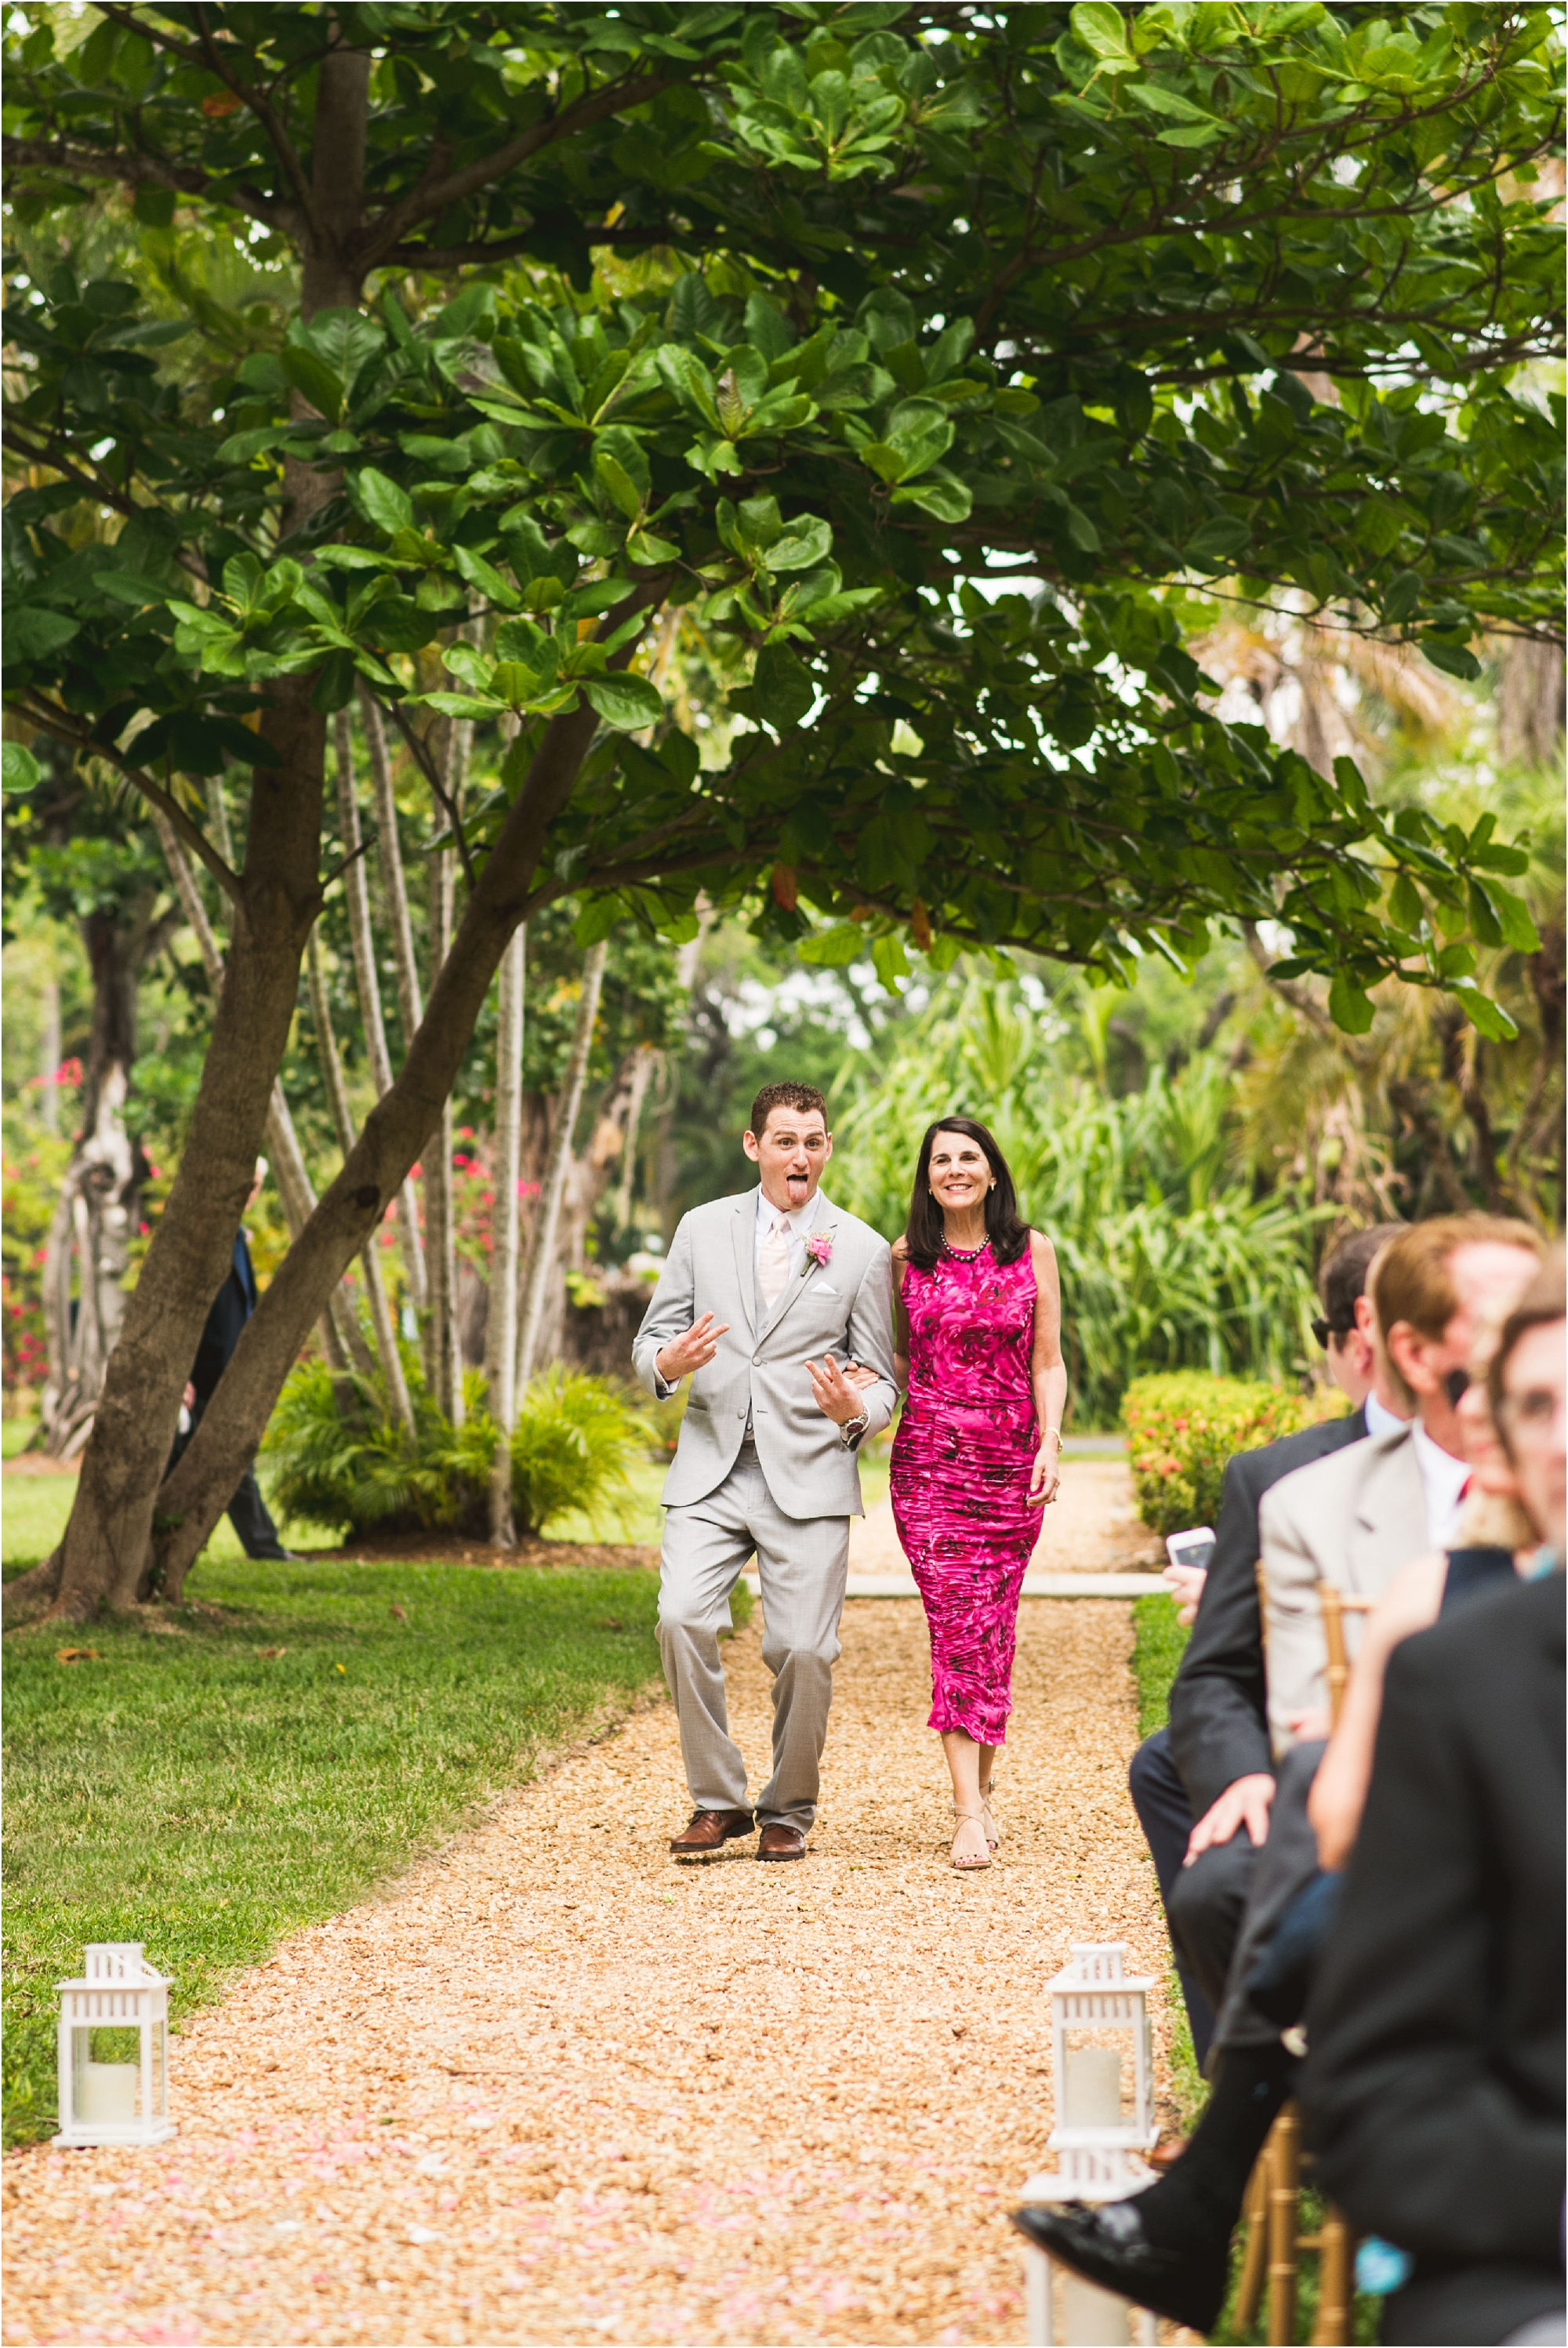 Spanish-Monastery-miami-beach-outdoor-elegant-wedding-photographer-jessenia-gonzalez_1146.jpg